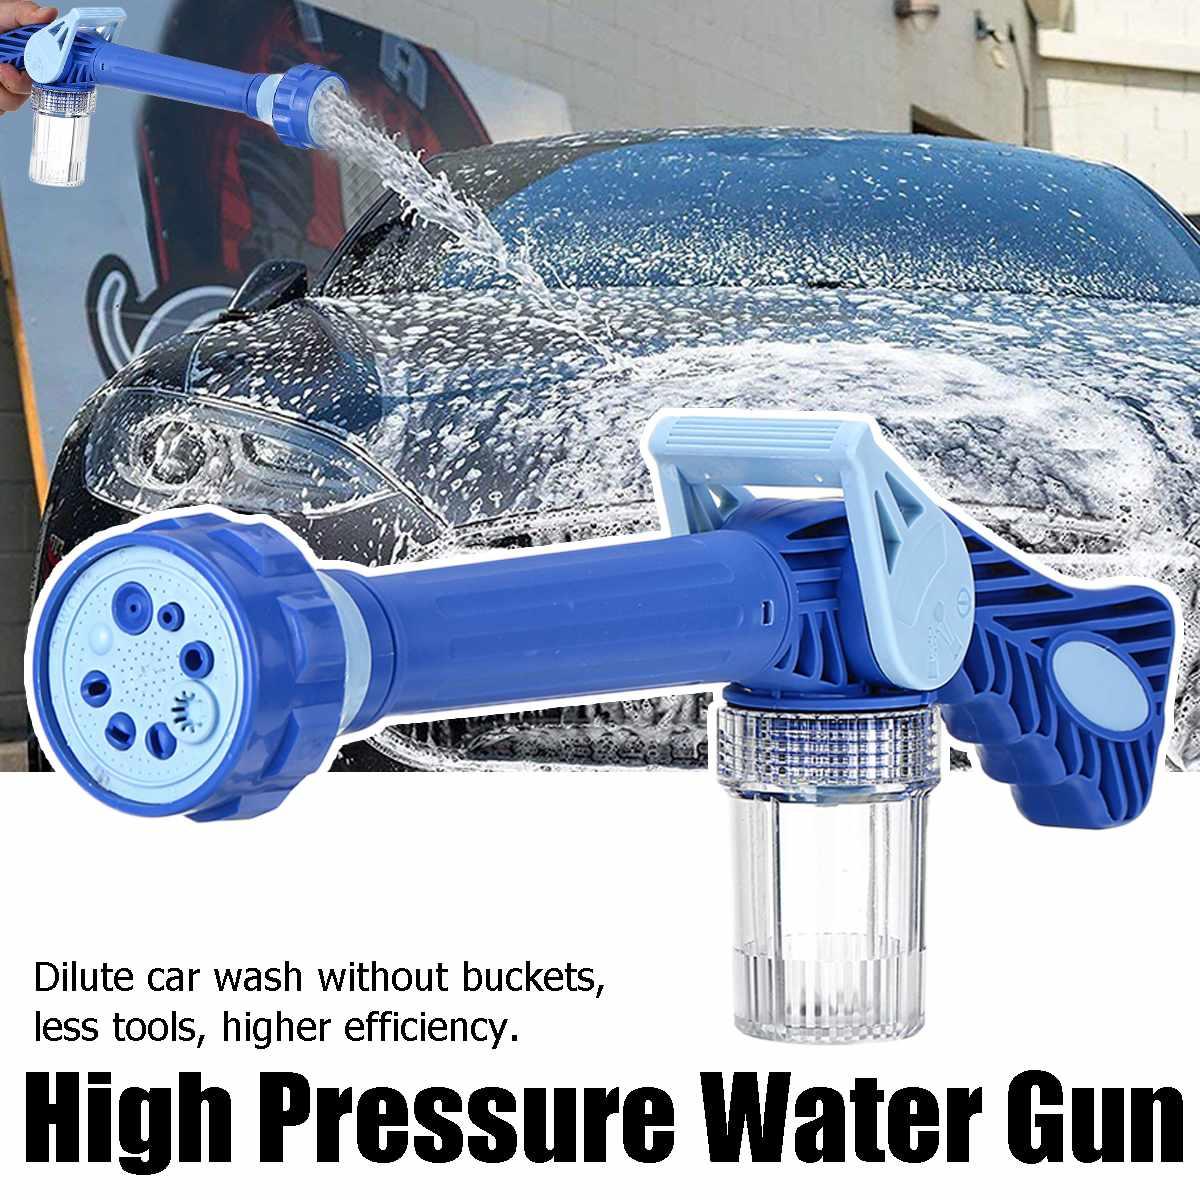 8 In 1 High pressure washer Car Wash gun Pressure Portable Car Deep Cleaning Spray Cleaner Watering Multifunction Foam Snow